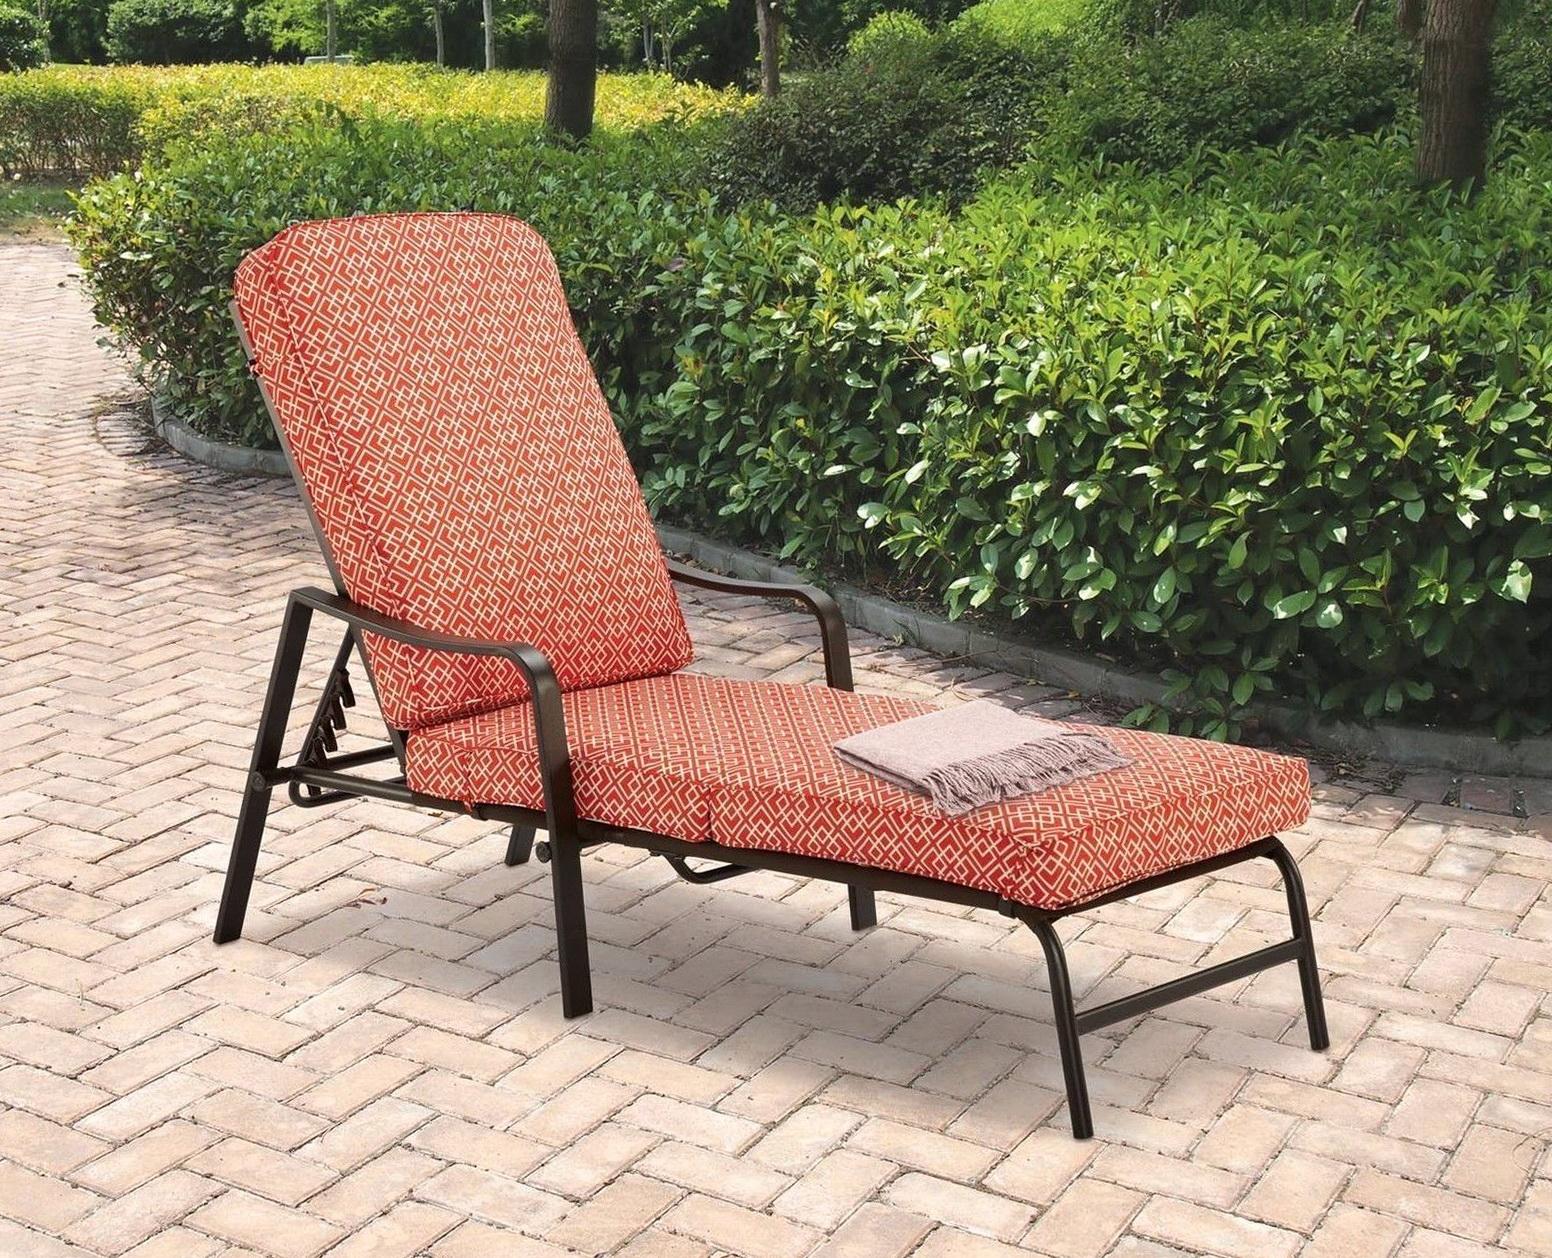 Patio Chaise Lounge Chairs Walmart